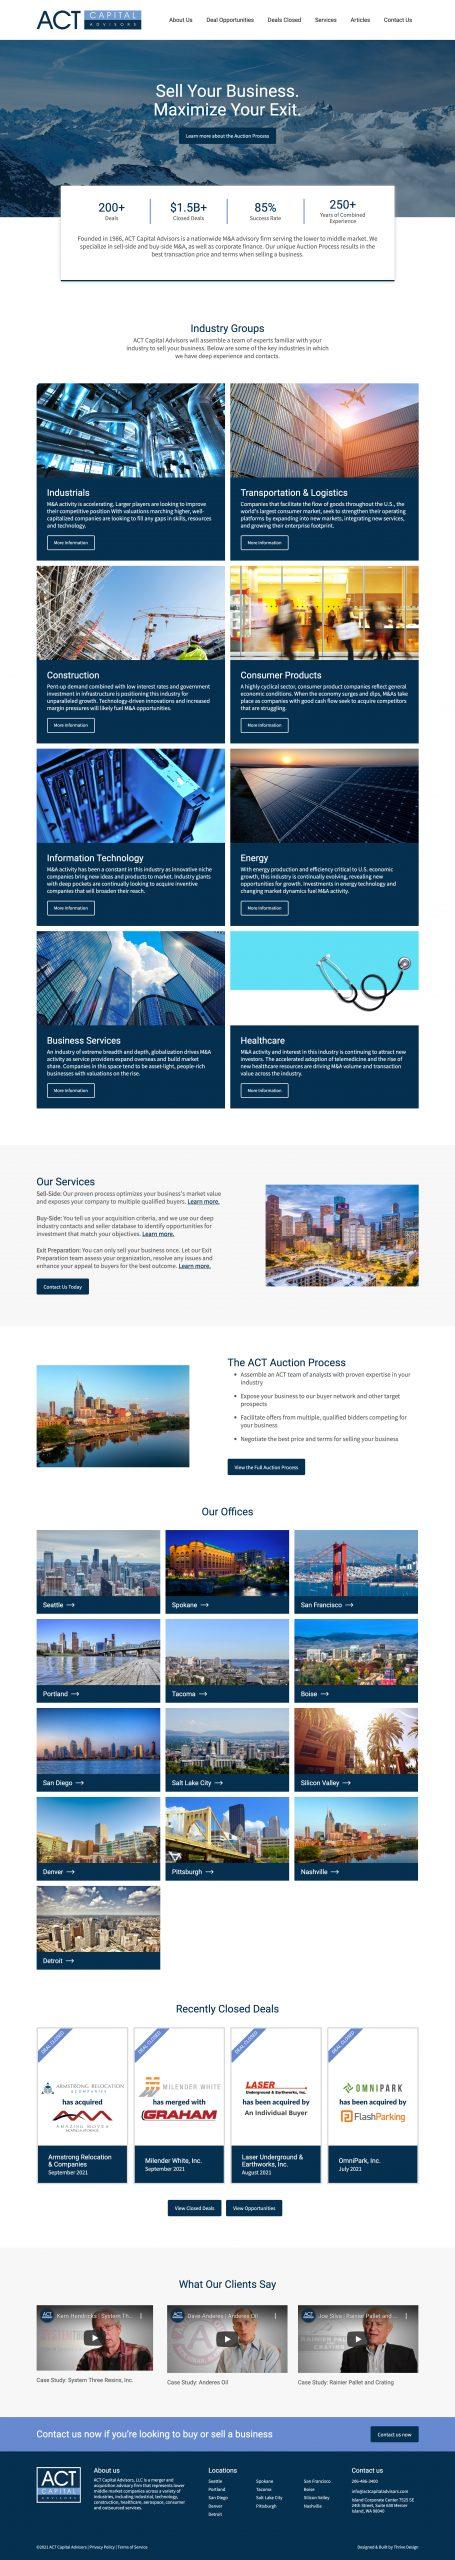 ACT Capital Advisors, M&A firm